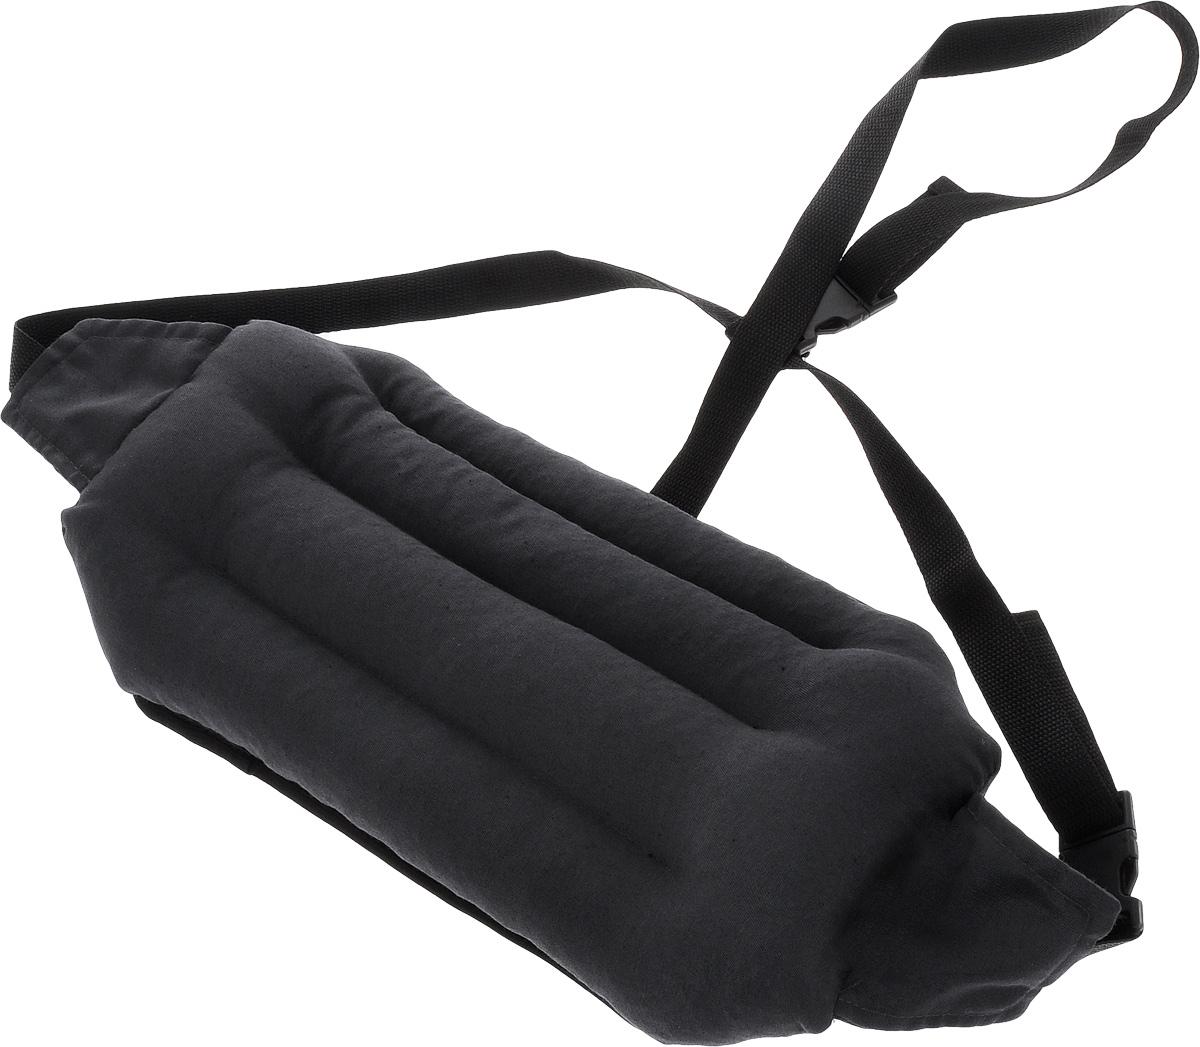 Подушка под спину Smart Textile Офис, наполнитель: лузга гречихи, 40 х 20 см str t2268